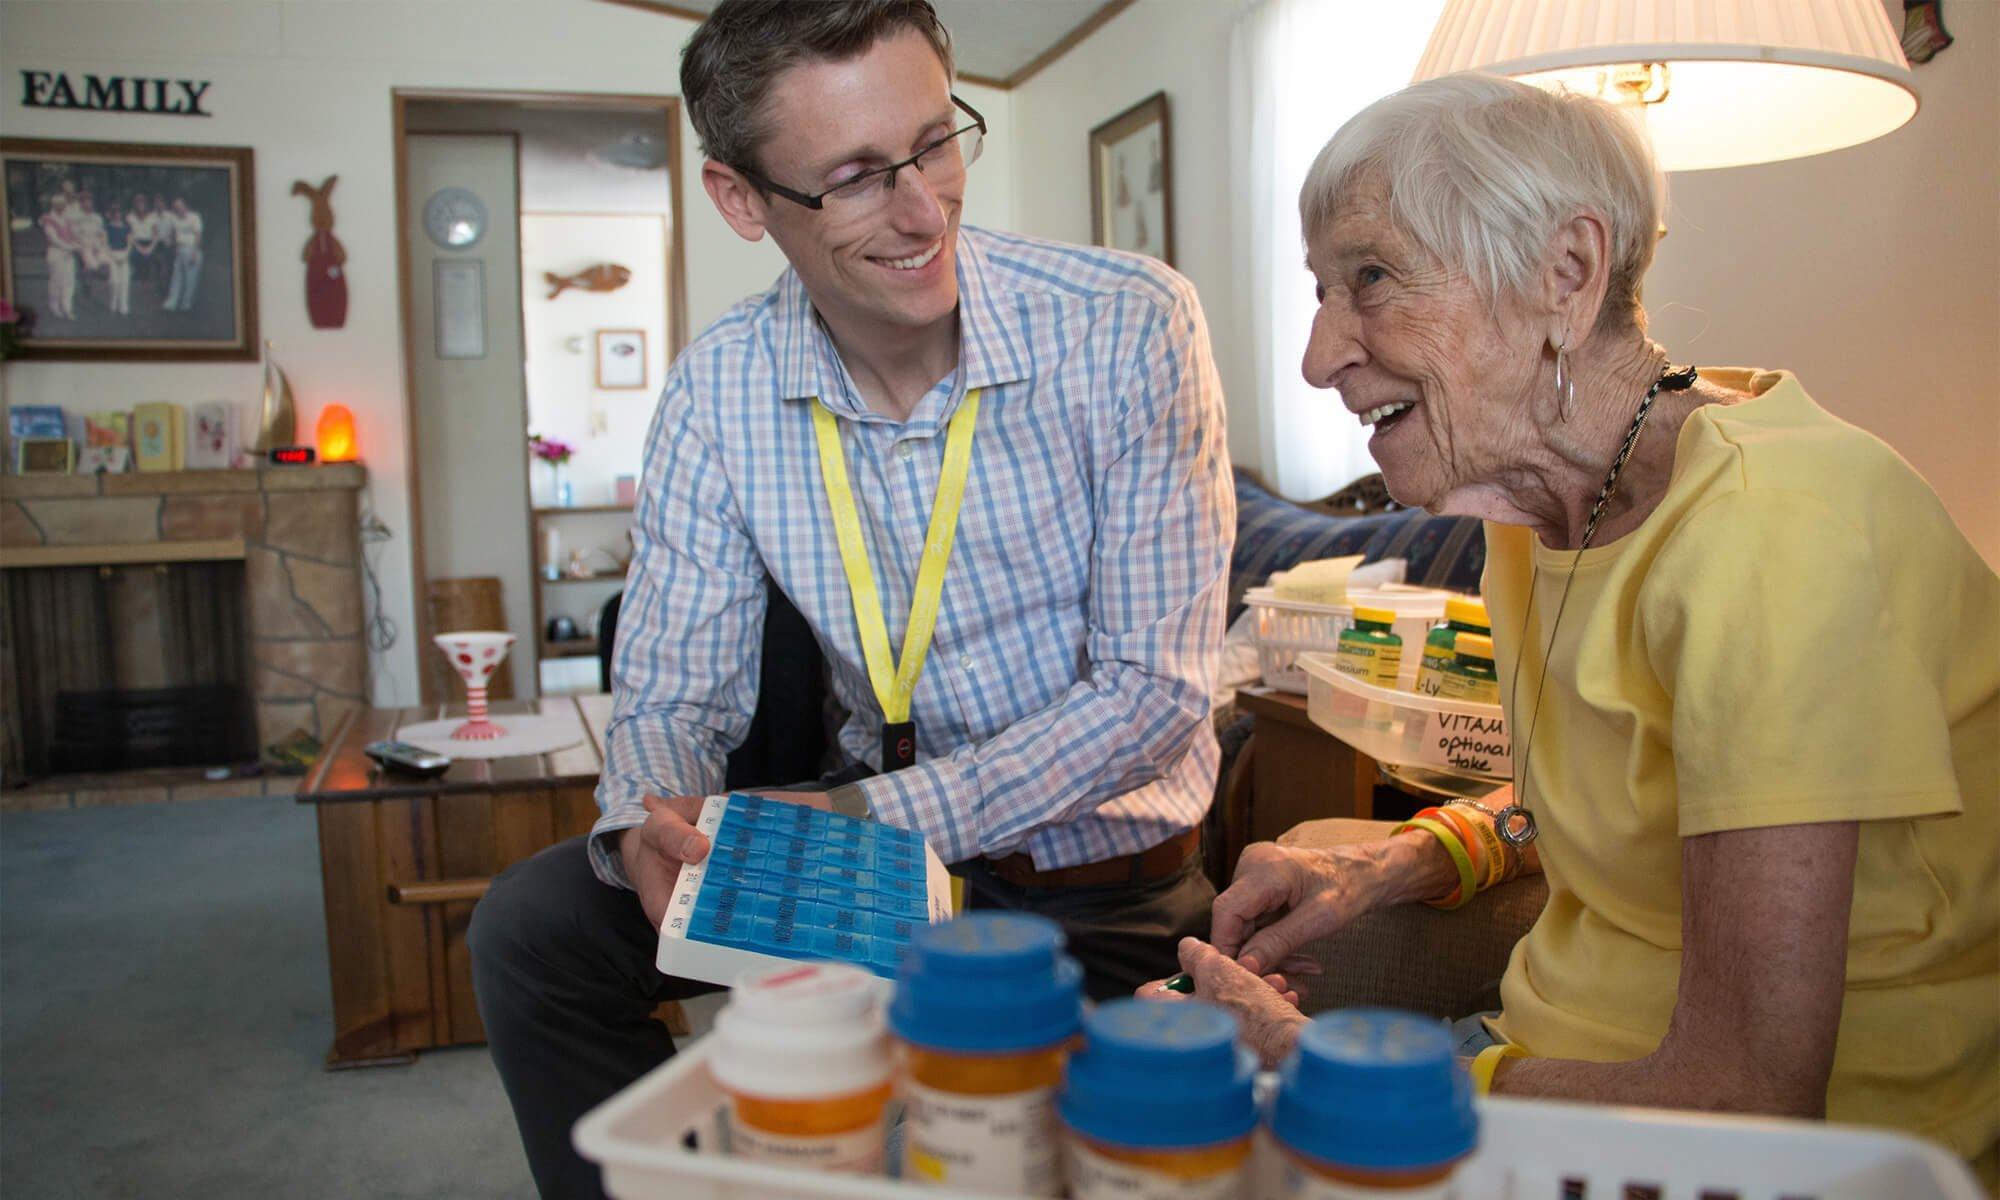 Concordia's Travis Suss selected for prestigious Emerging Leaders in Aging Program